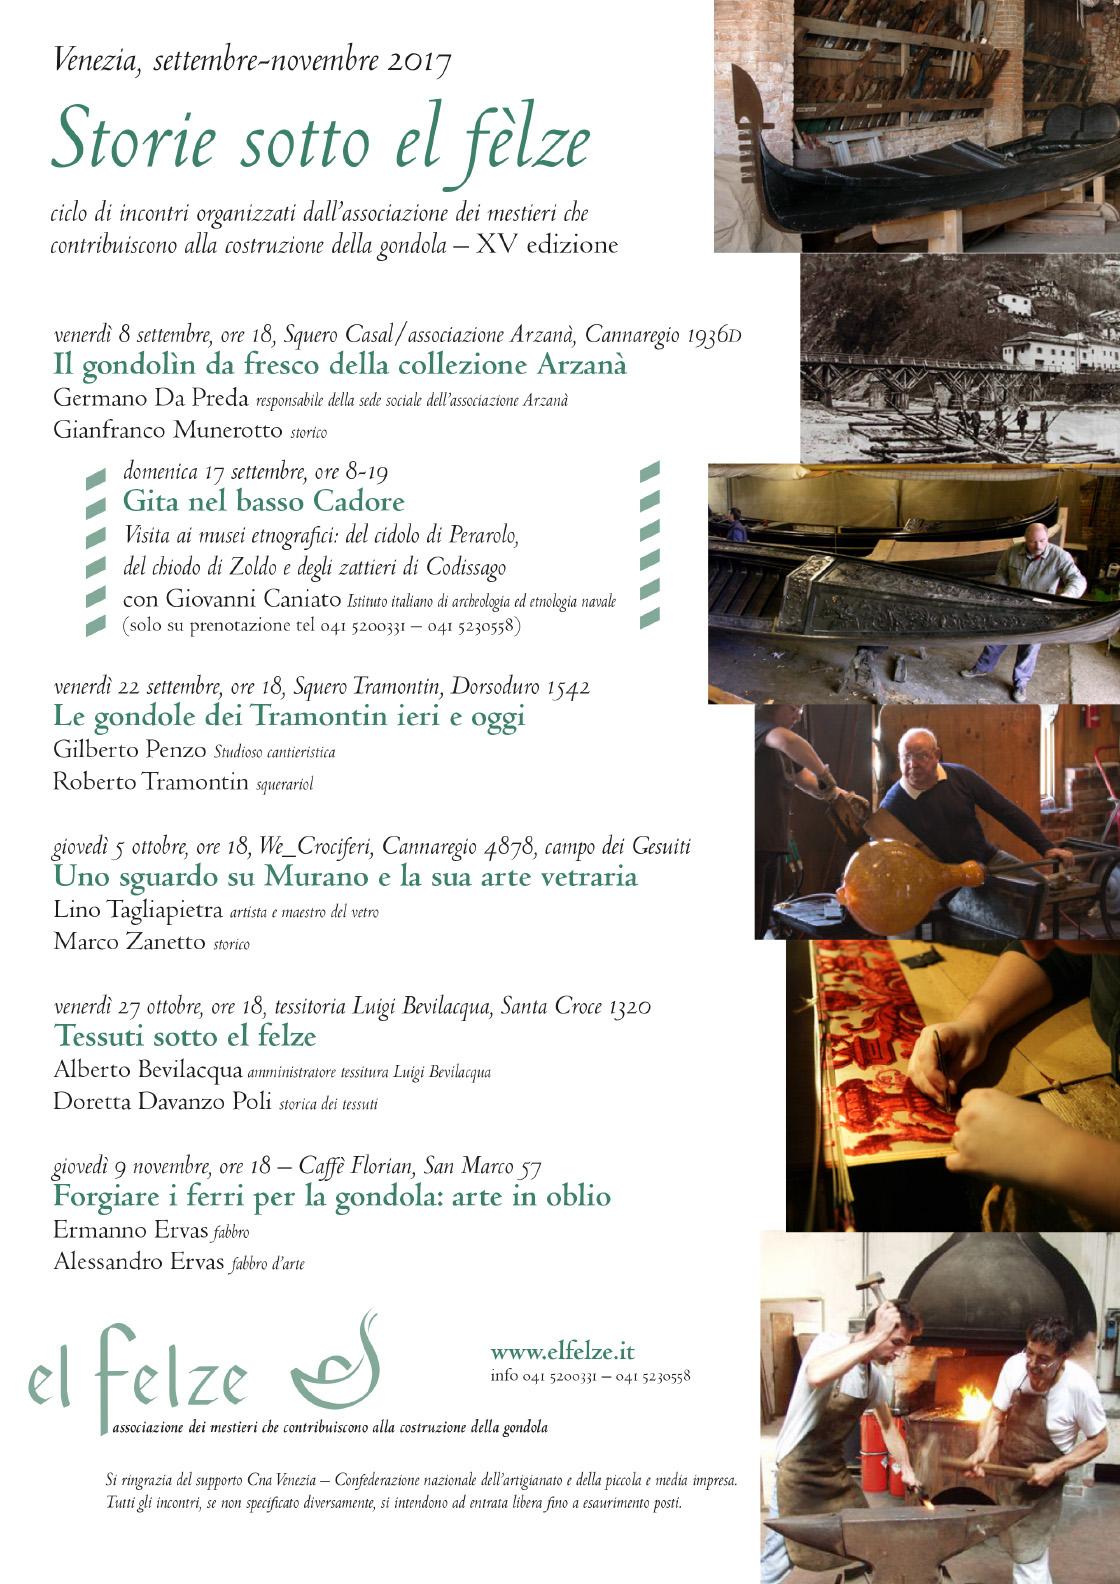 Locandina Storie Sotto El Felze 2017 - homepage